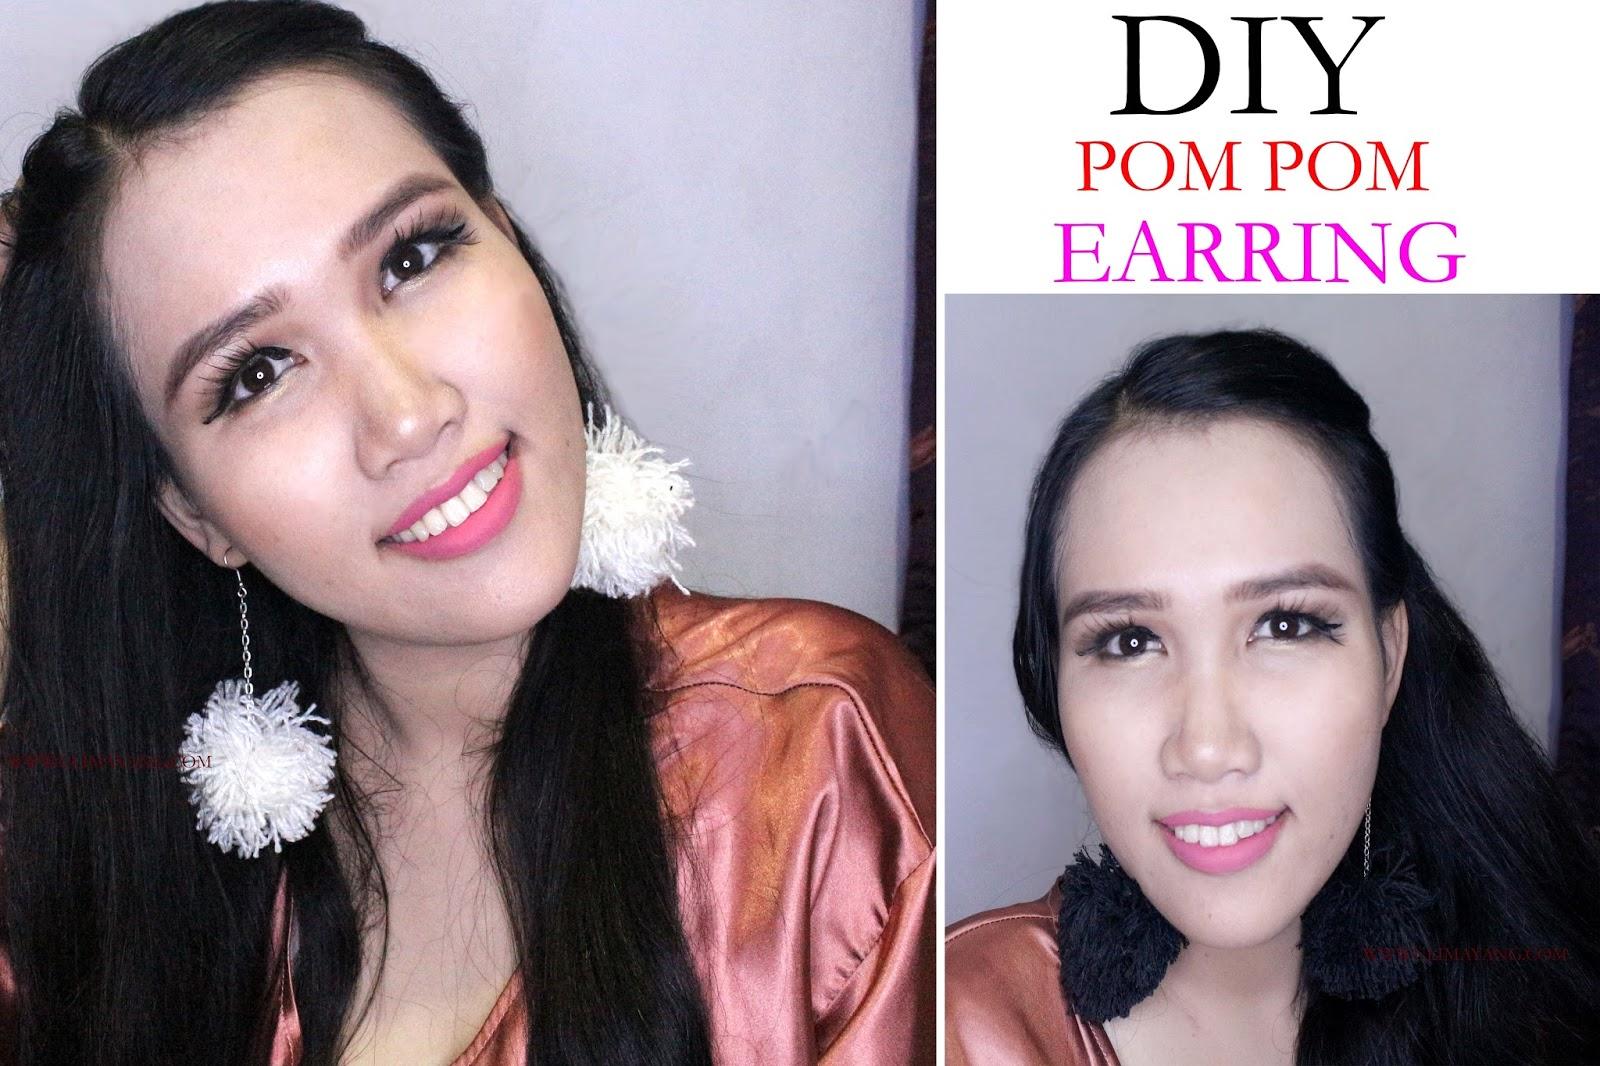 Uli Mayang DIY Cara Buat Anting Pompom Pompom Earring